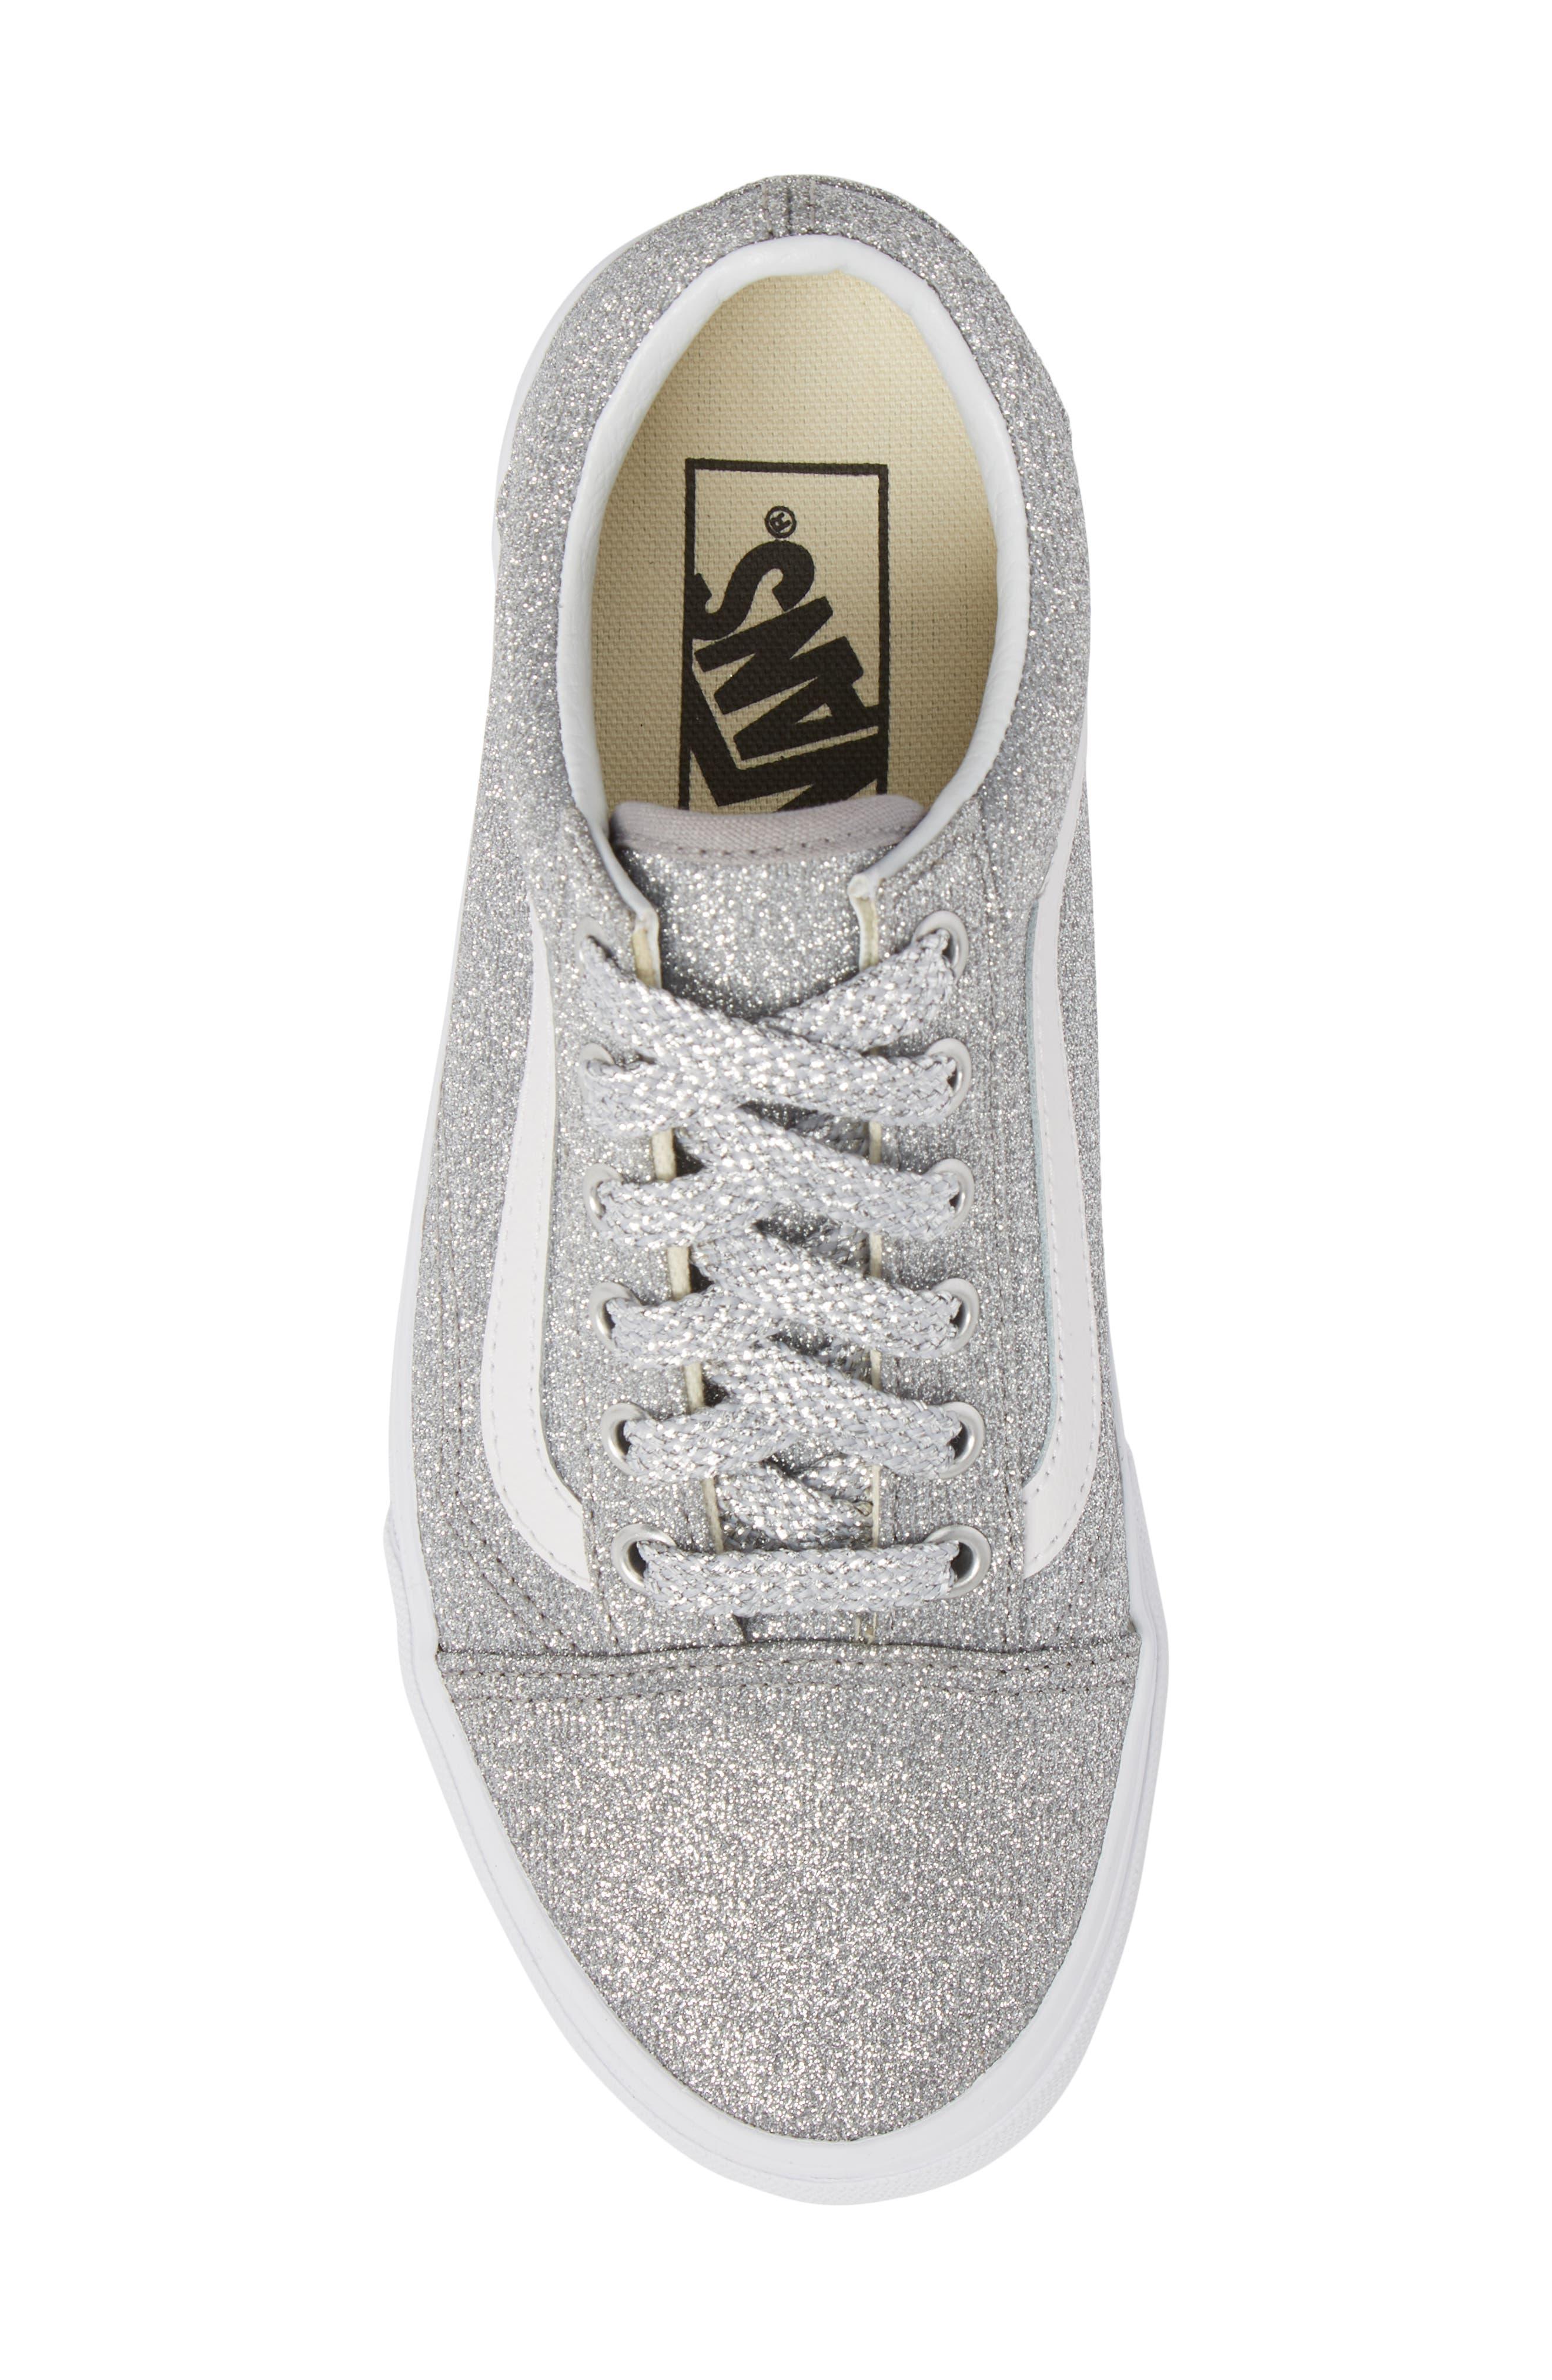 UA Old Skool Glitter Low Top Sneaker,                             Alternate thumbnail 5, color,                             SILVER/ TRUE WHITE GLITTER